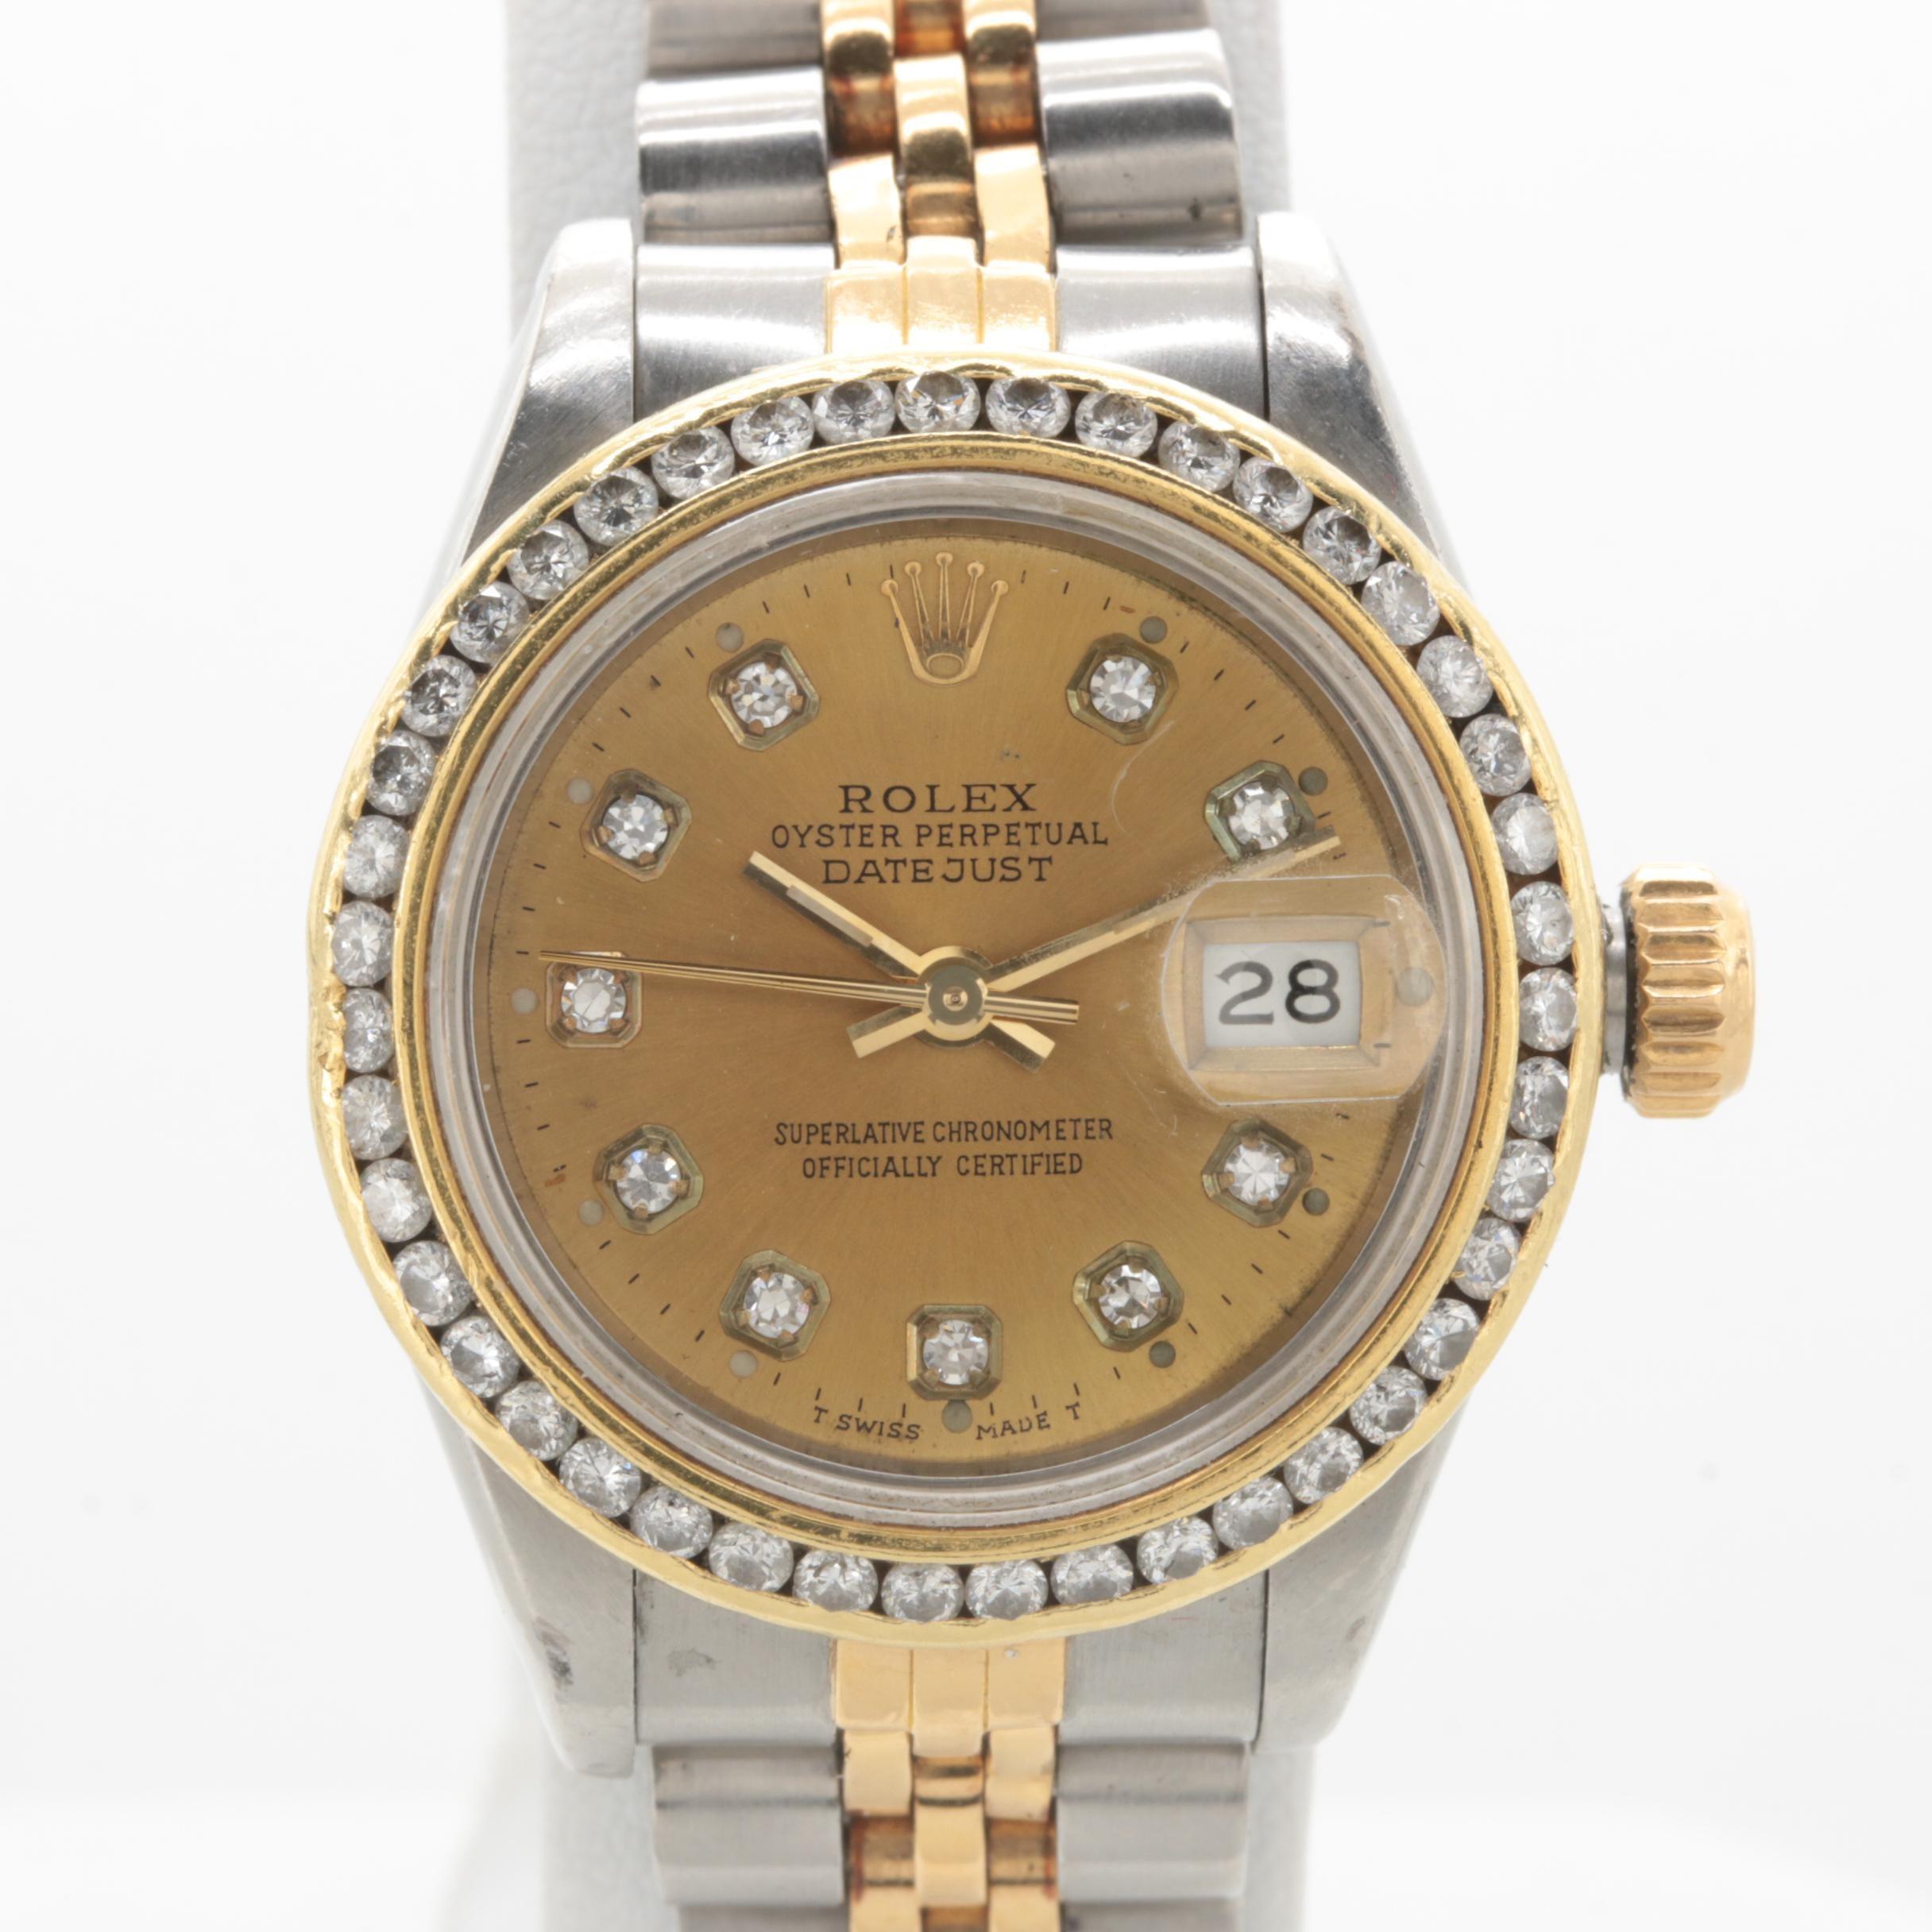 Circa 1987 Rolex Stainless Steel and 18K Yellow Gold 0.96 CTW Diamond Wristwatch